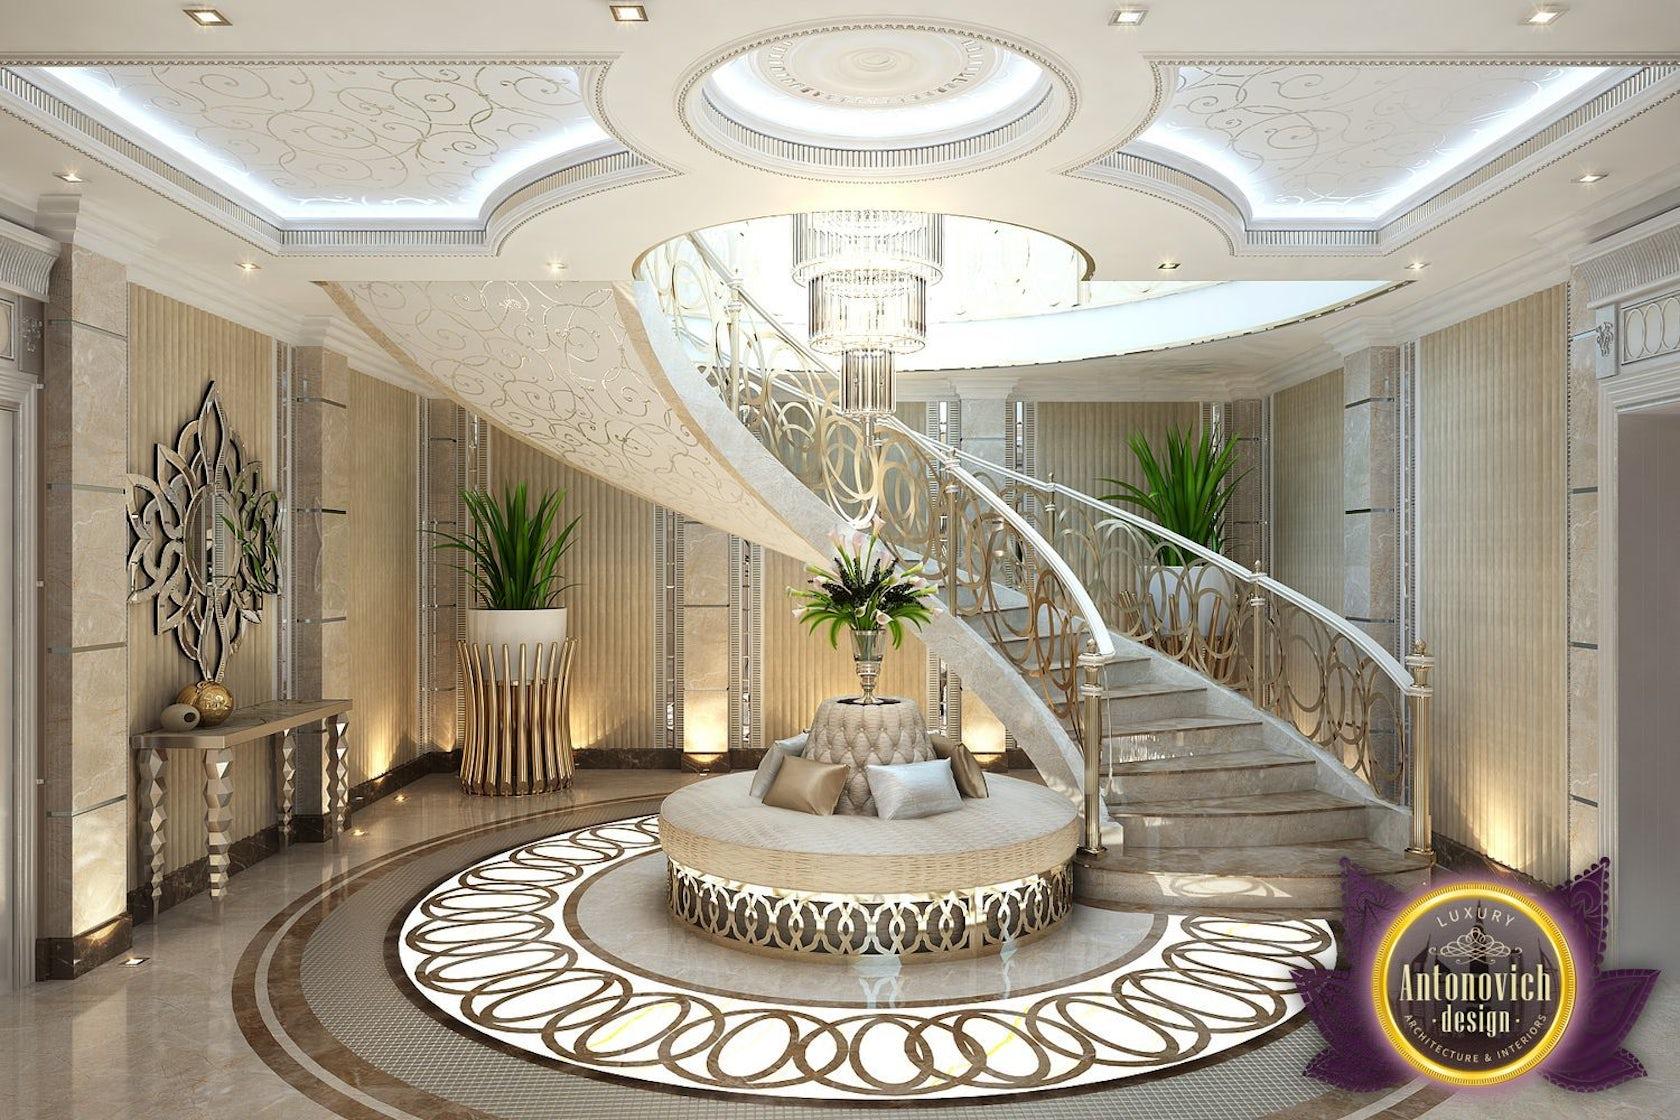 Living Room Decoration Ideas by Luxury Antonovich Design on ...